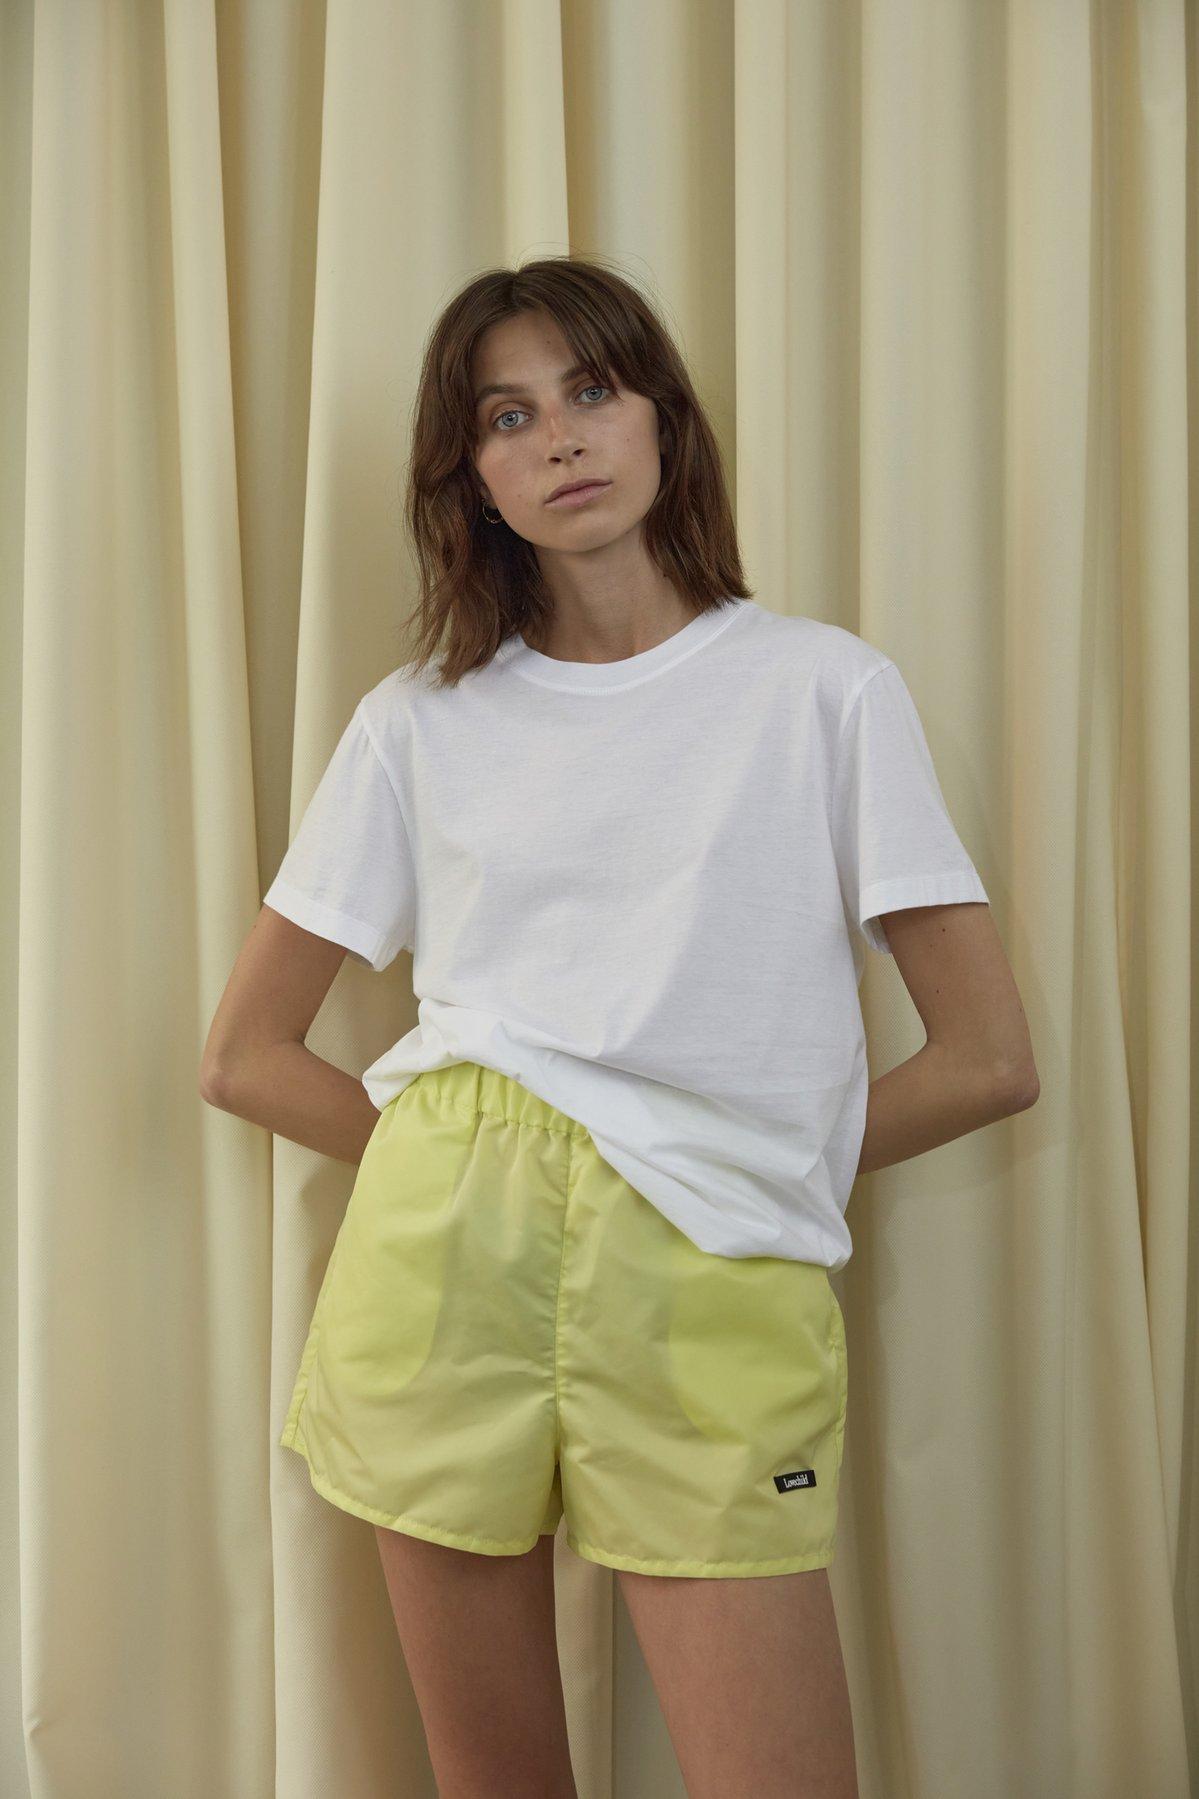 Donnat-shirtAlessioshorts_1199x1799